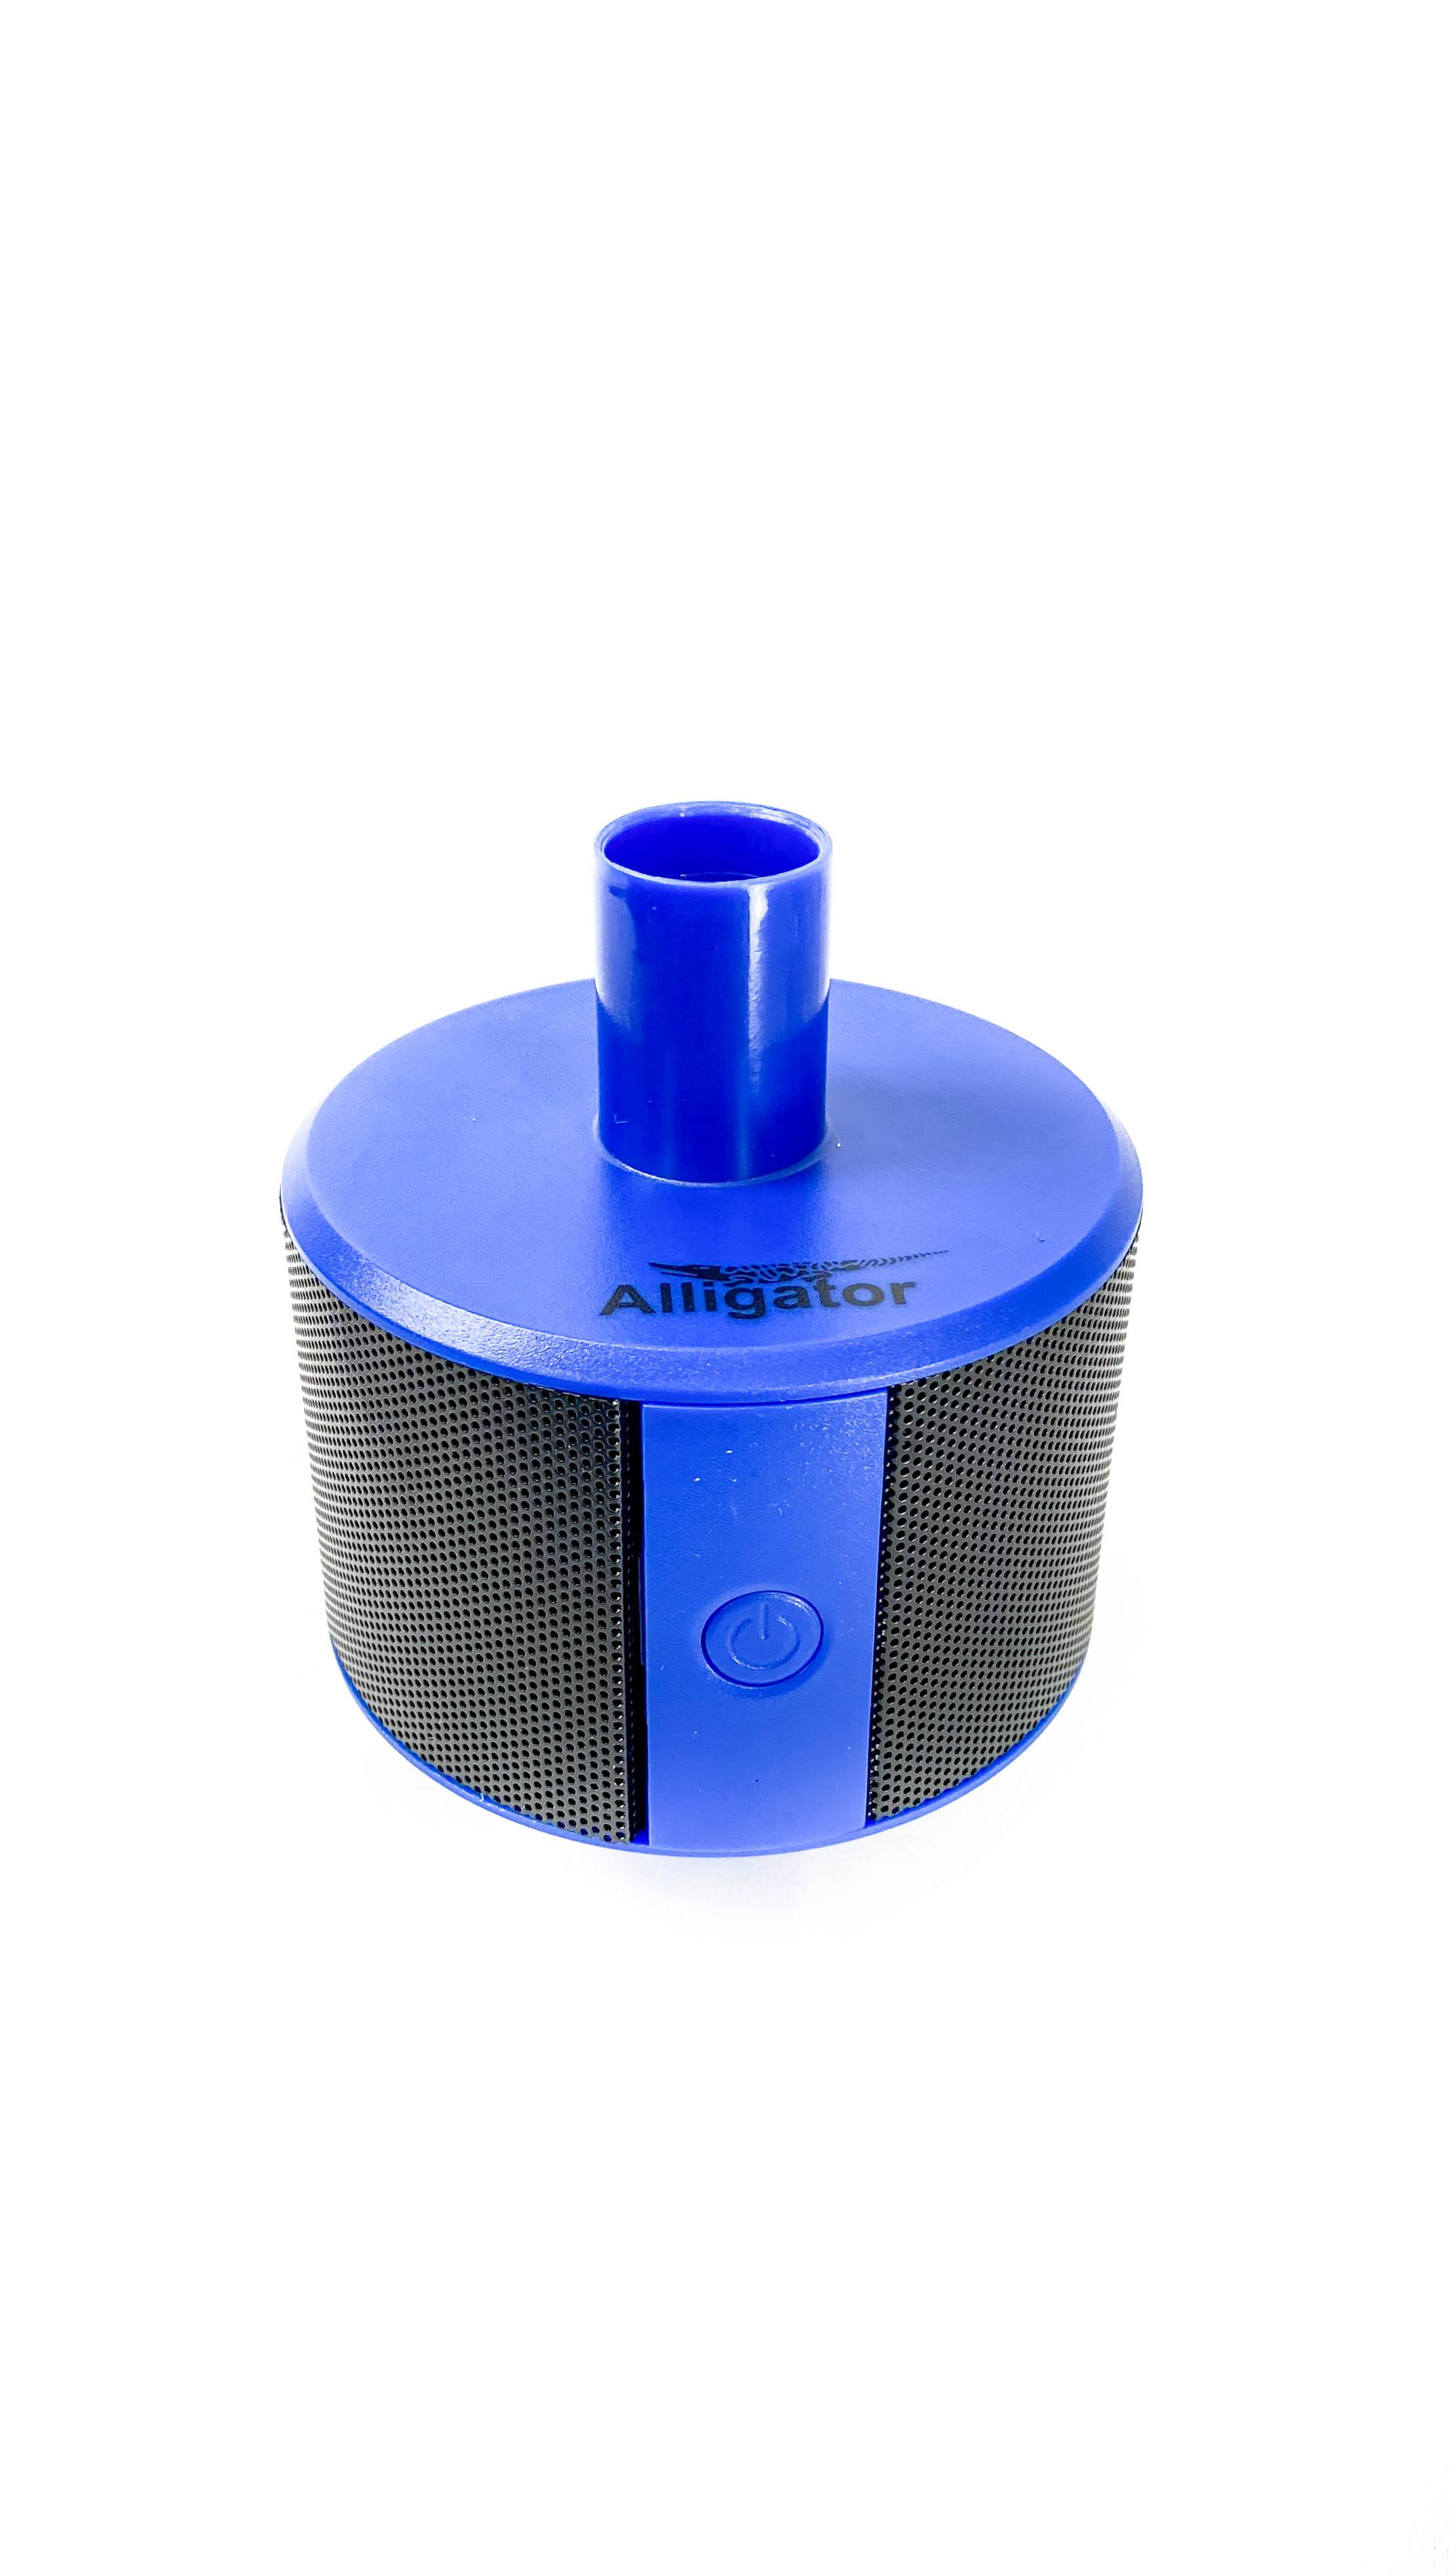 Alligator - Shishaspeaker Blau